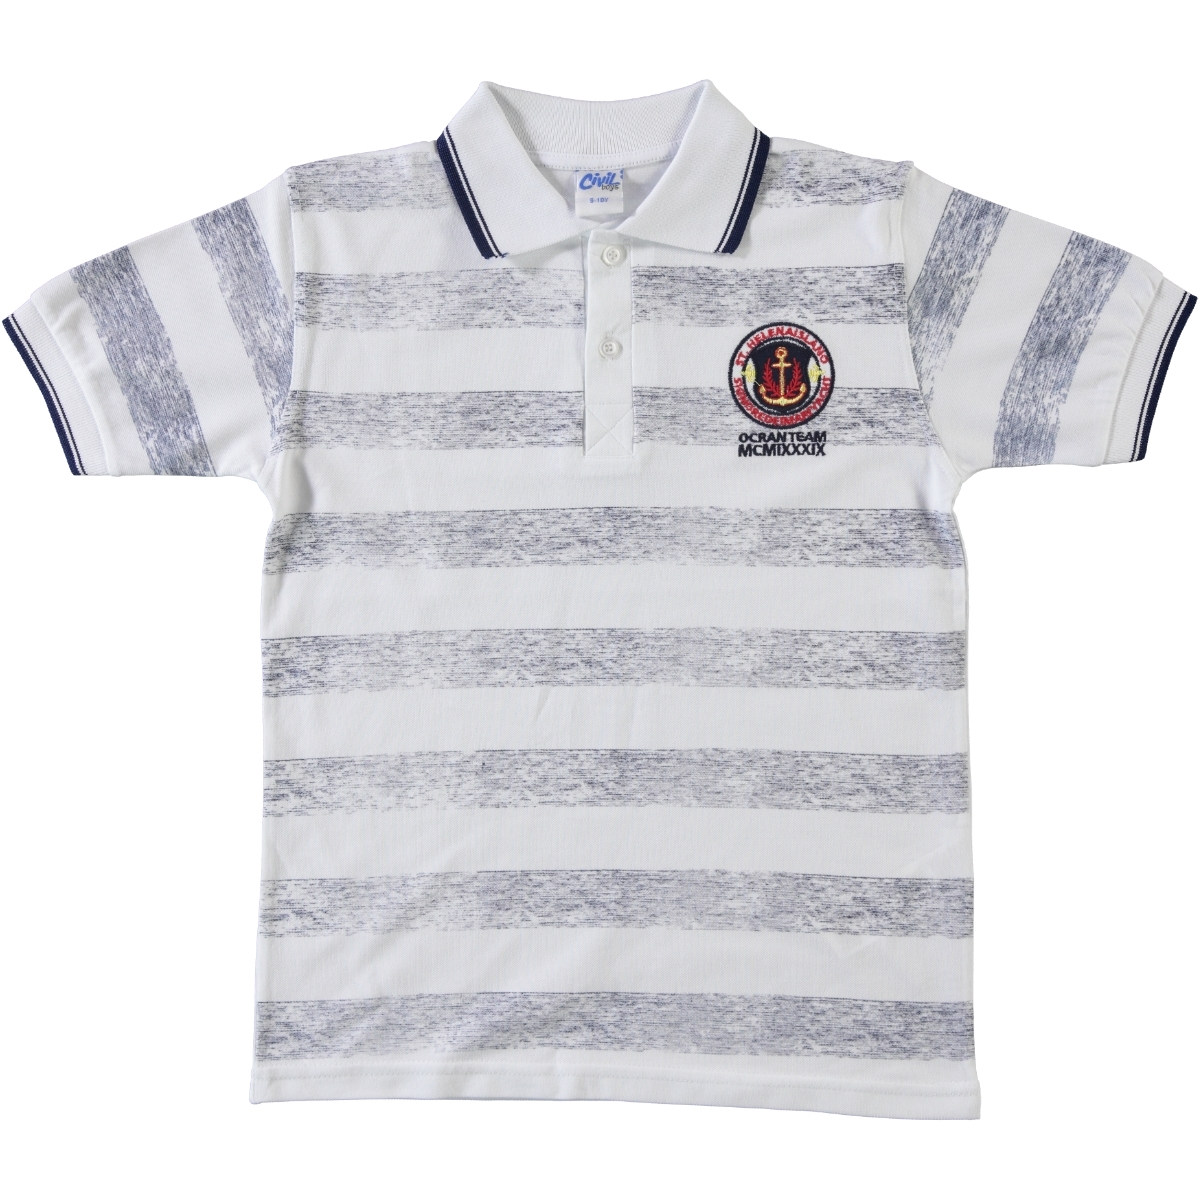 Civil Boys Boy T-Shirt White Ages 6-9